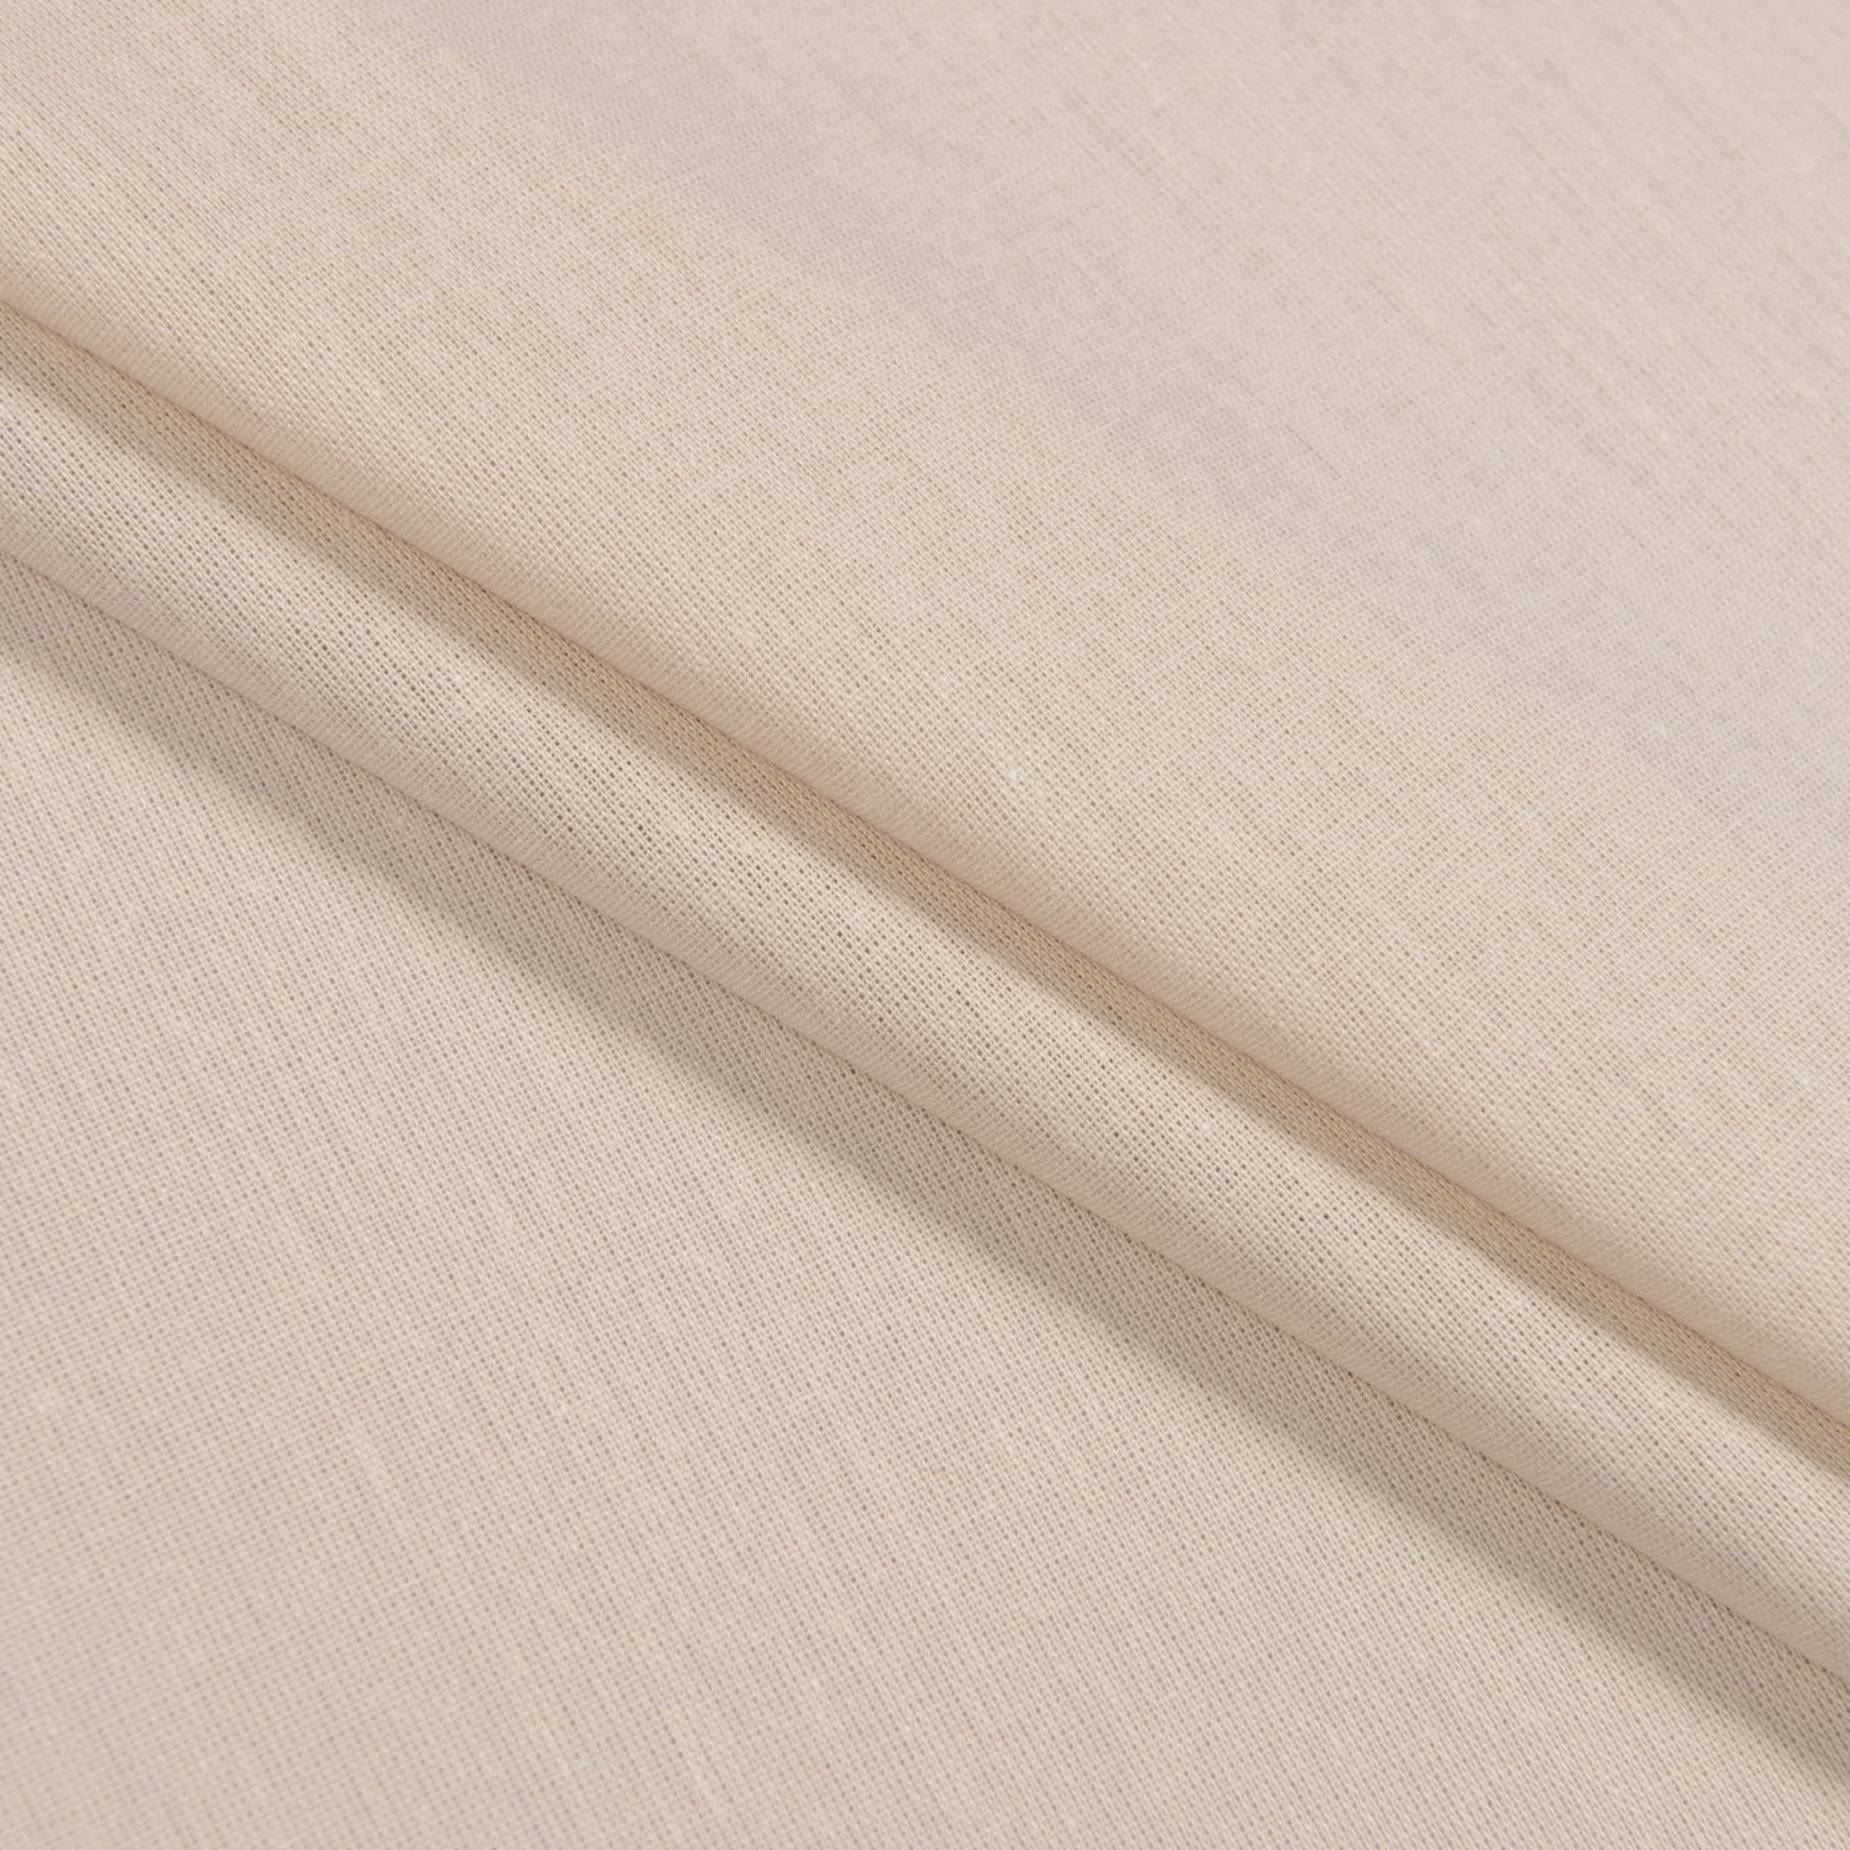 Бязь, персиковый, 50х50 см, хлопок 100%, 125 г/м²